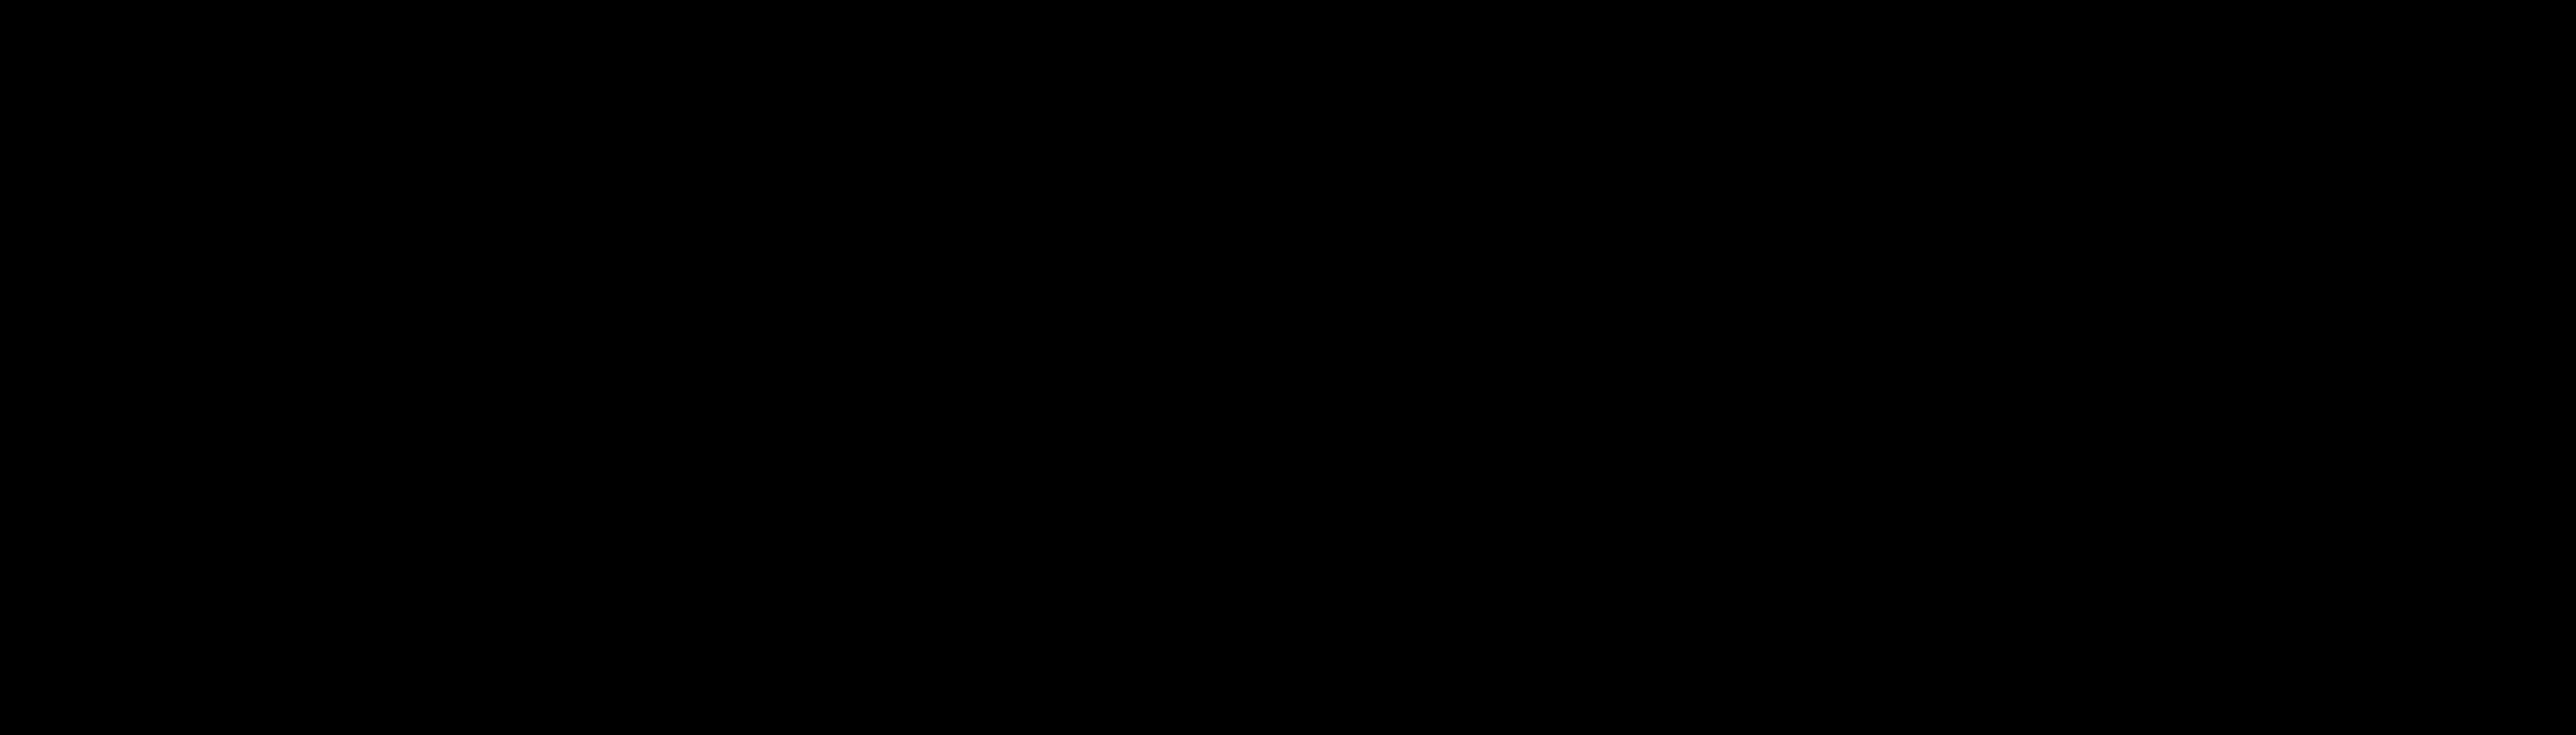 N-(6-Aminooxyacetamidohexyl-d<sub>4</sub>)-biotinamide